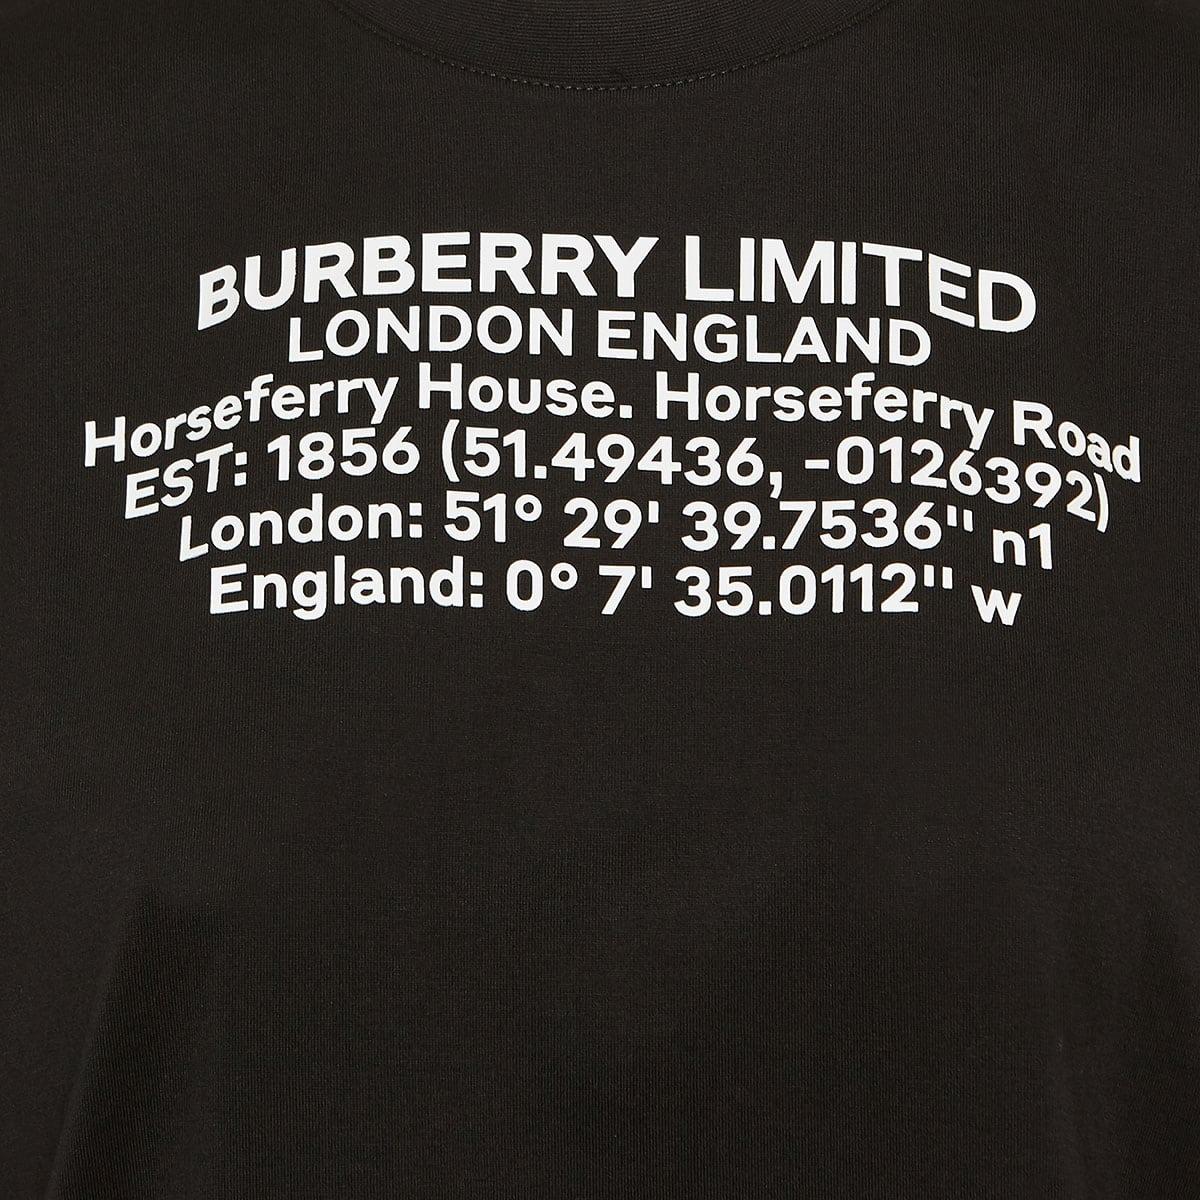 Oversized location print t-shirt